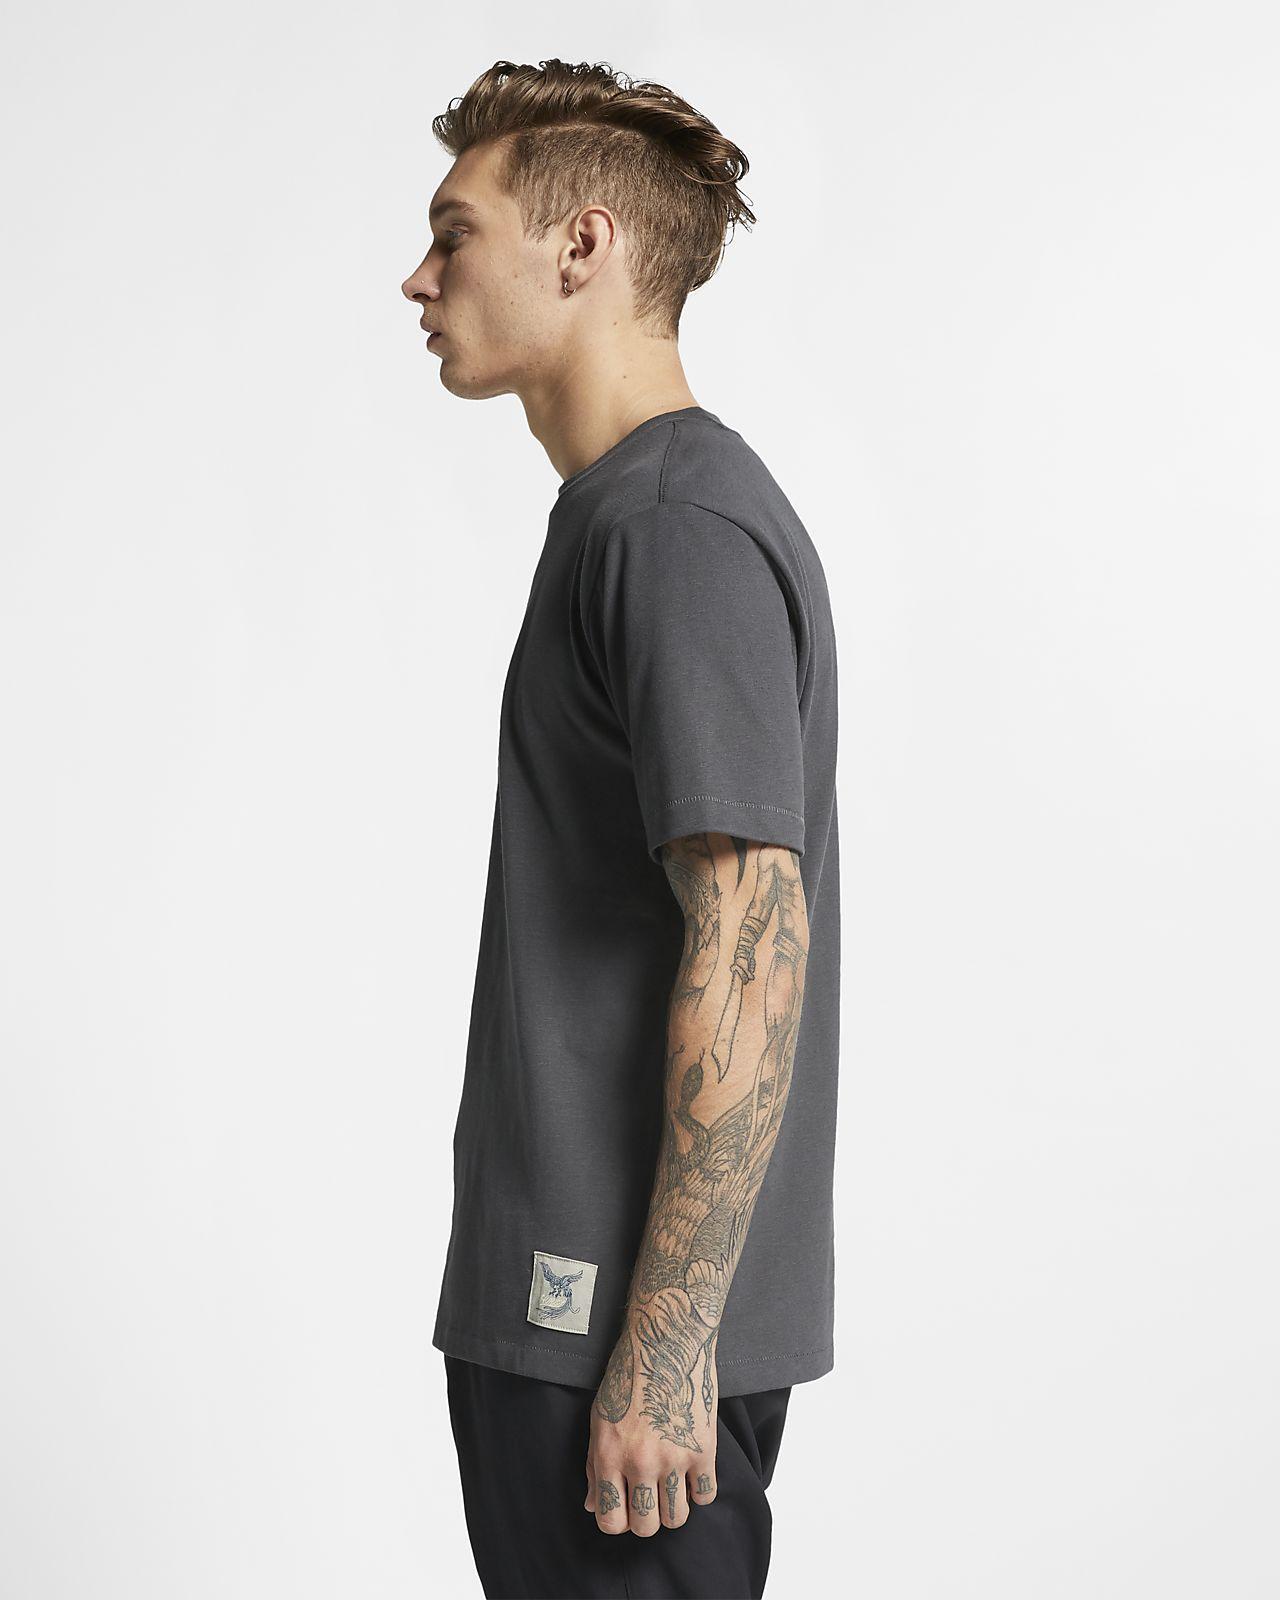 5b4f9224 Hurley Dri-FIT Savage Men's Short-Sleeve Shirt. Nike.com